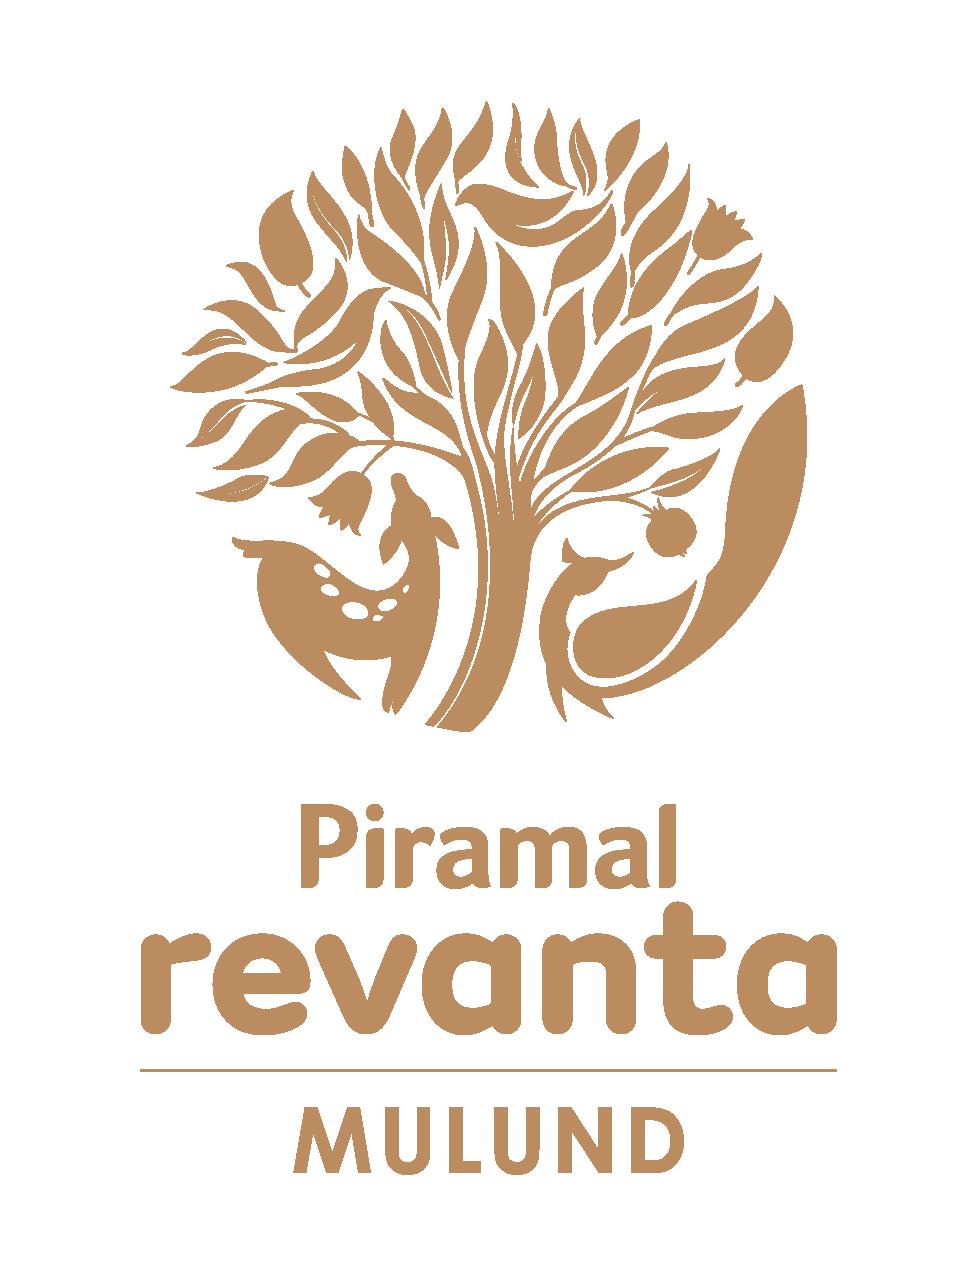 Piramal Revanta logo